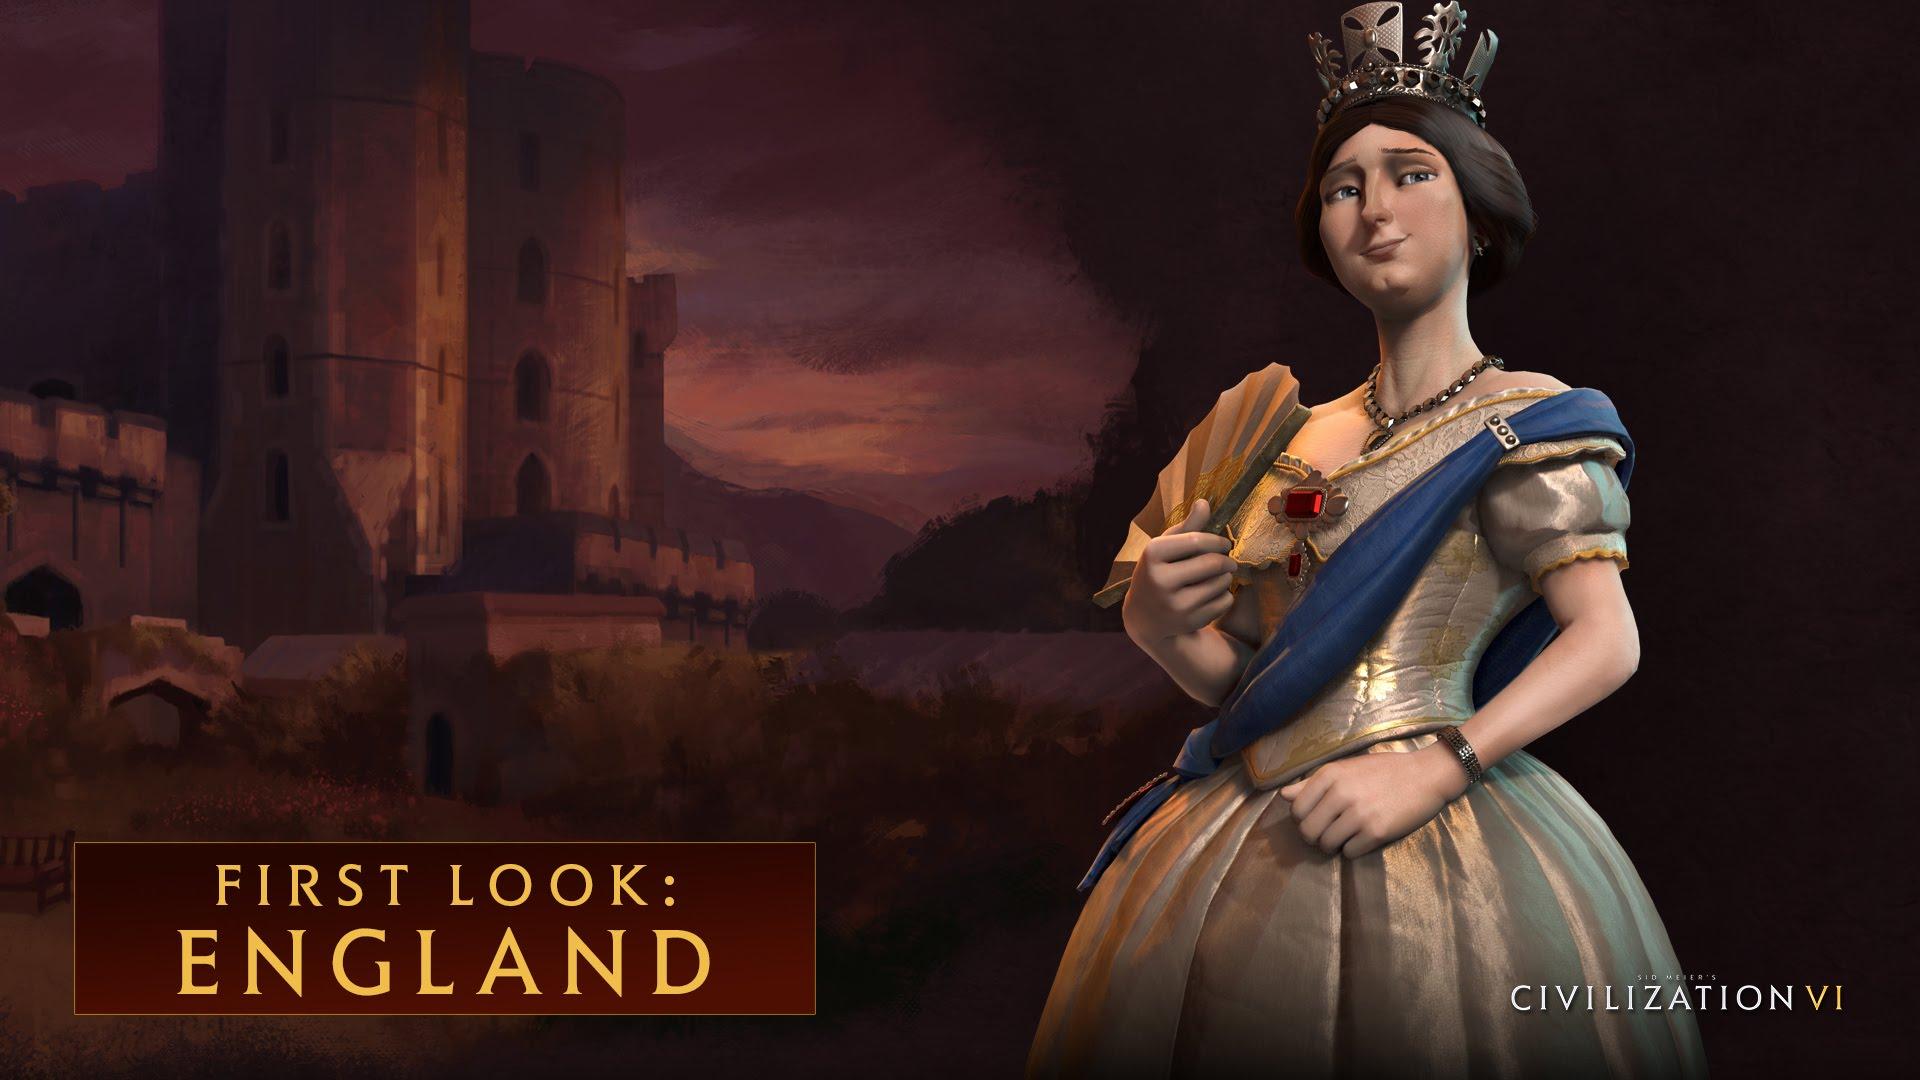 CIVILIZATION VI - First Look: England